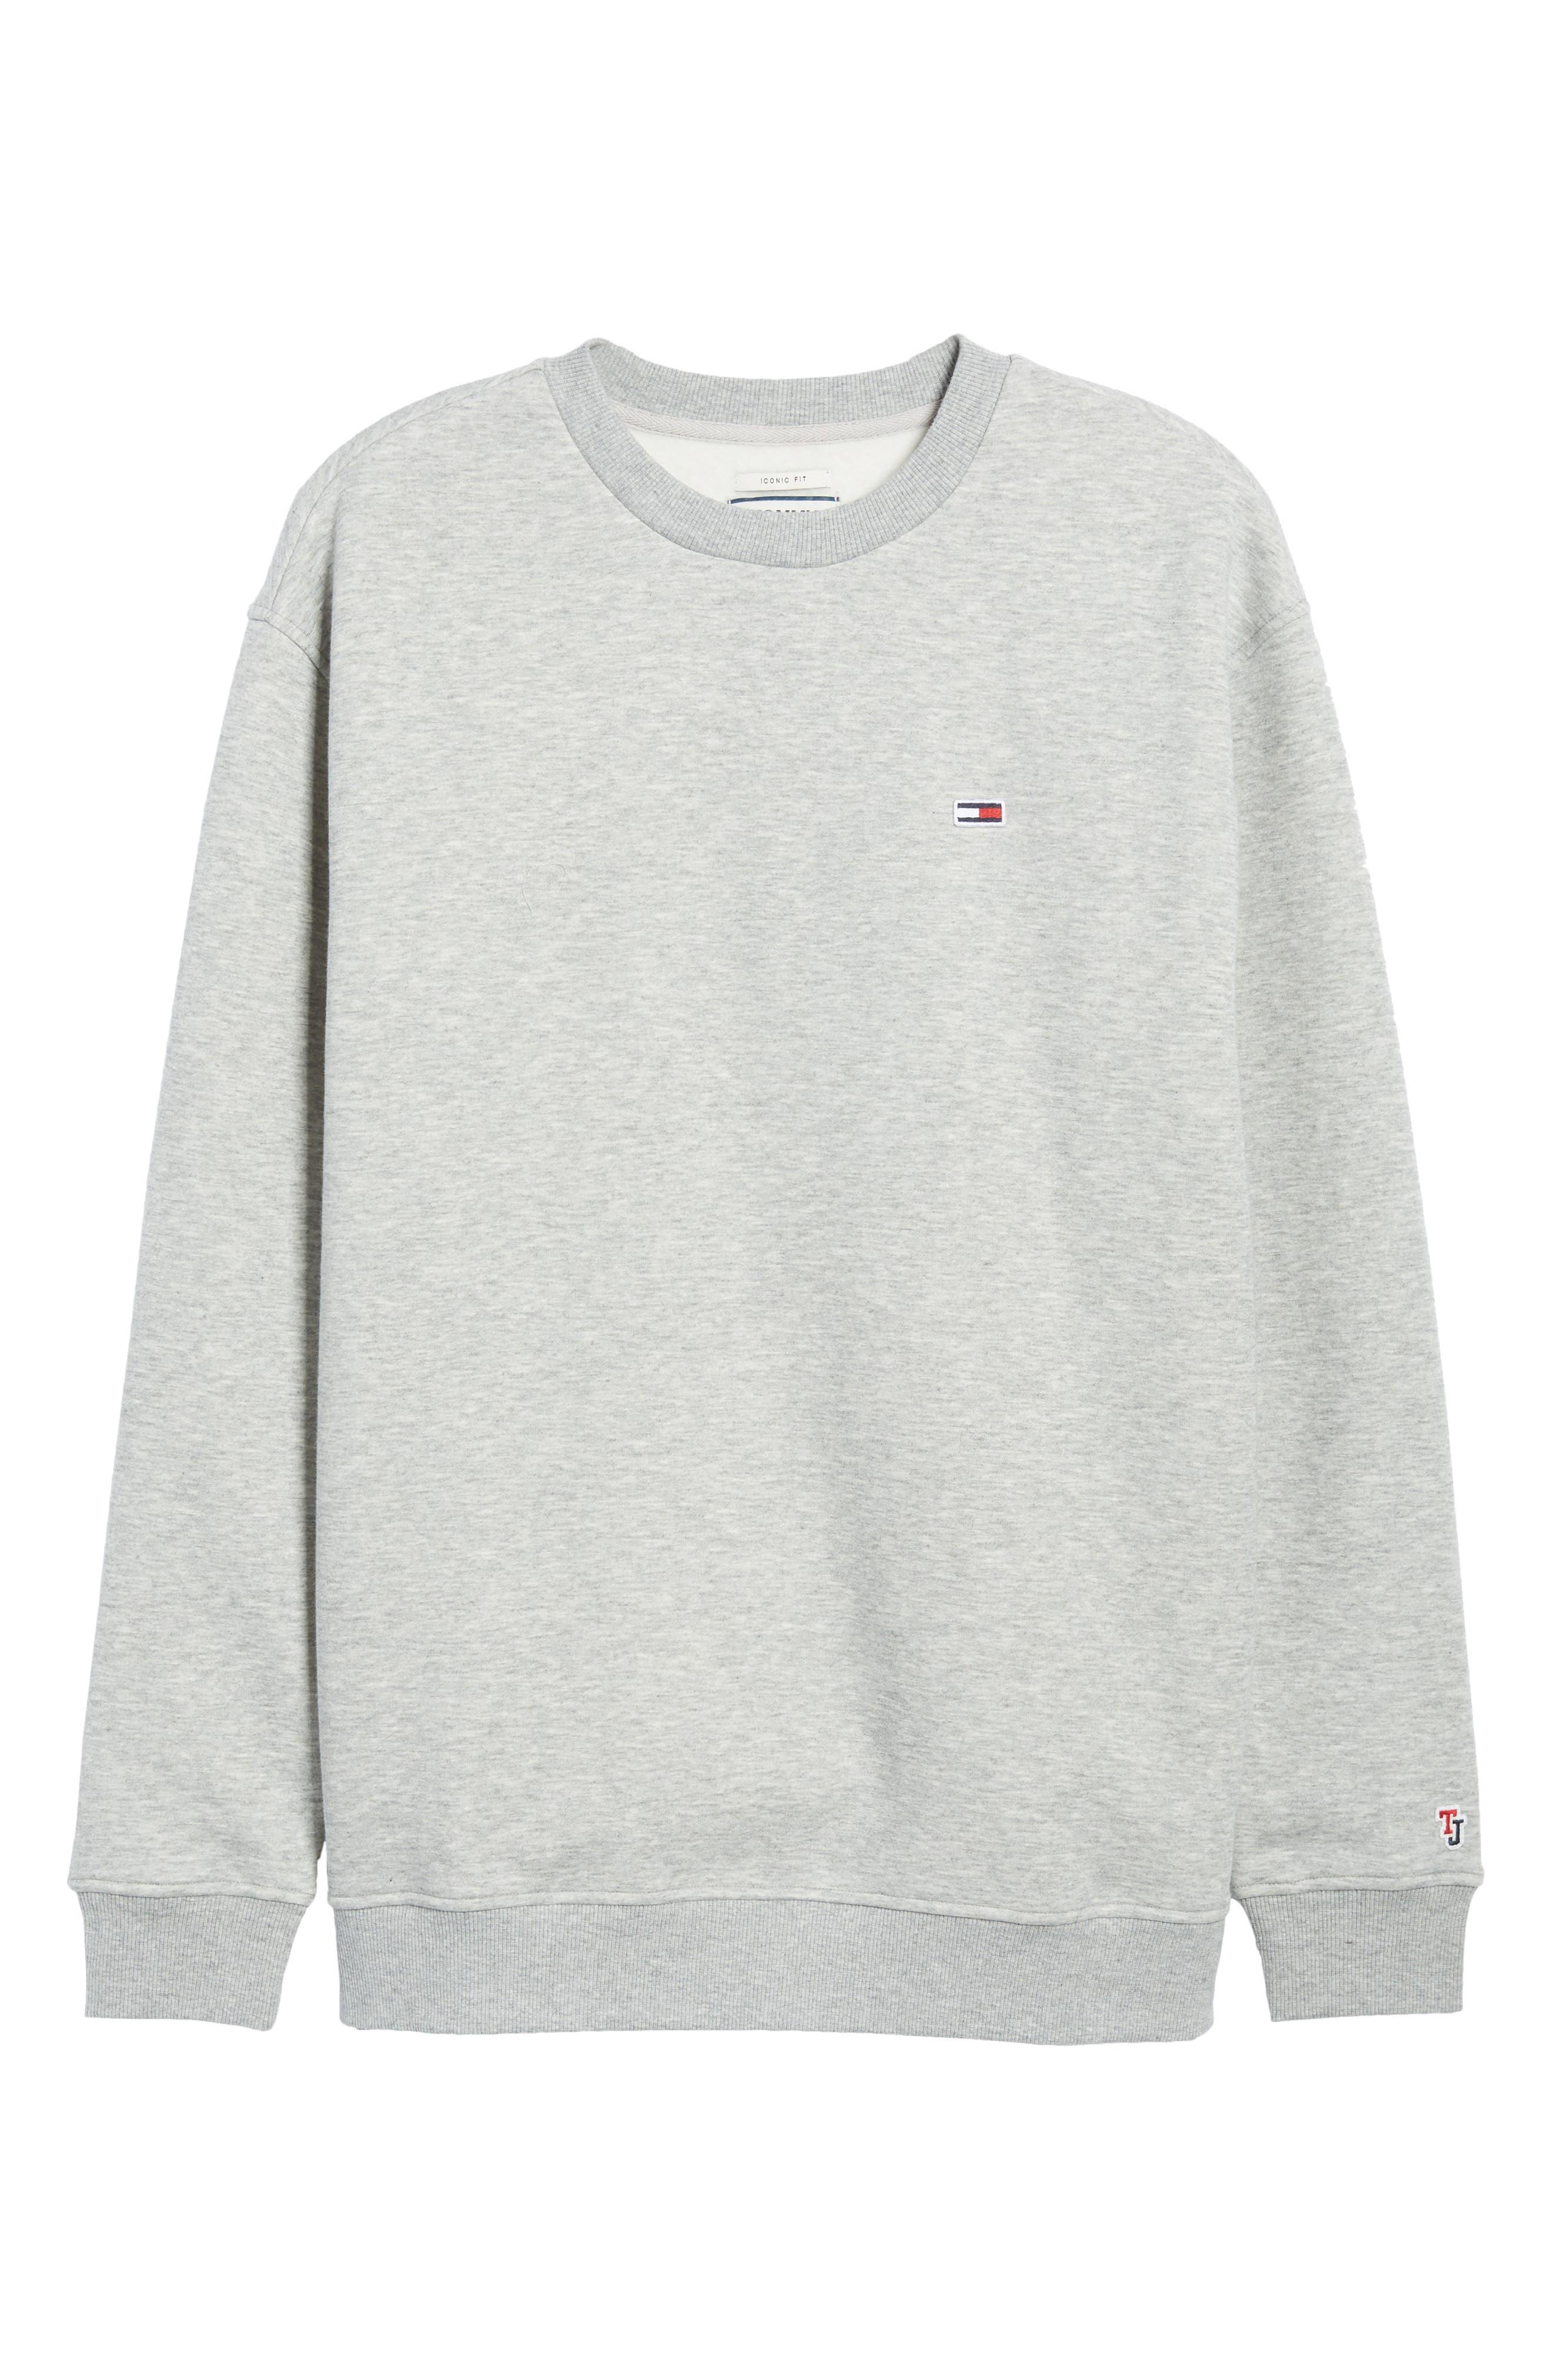 Tommy Classics Crewneck Sweatshirt,                             Alternate thumbnail 6, color,                             LIGHT GREY HEATHER